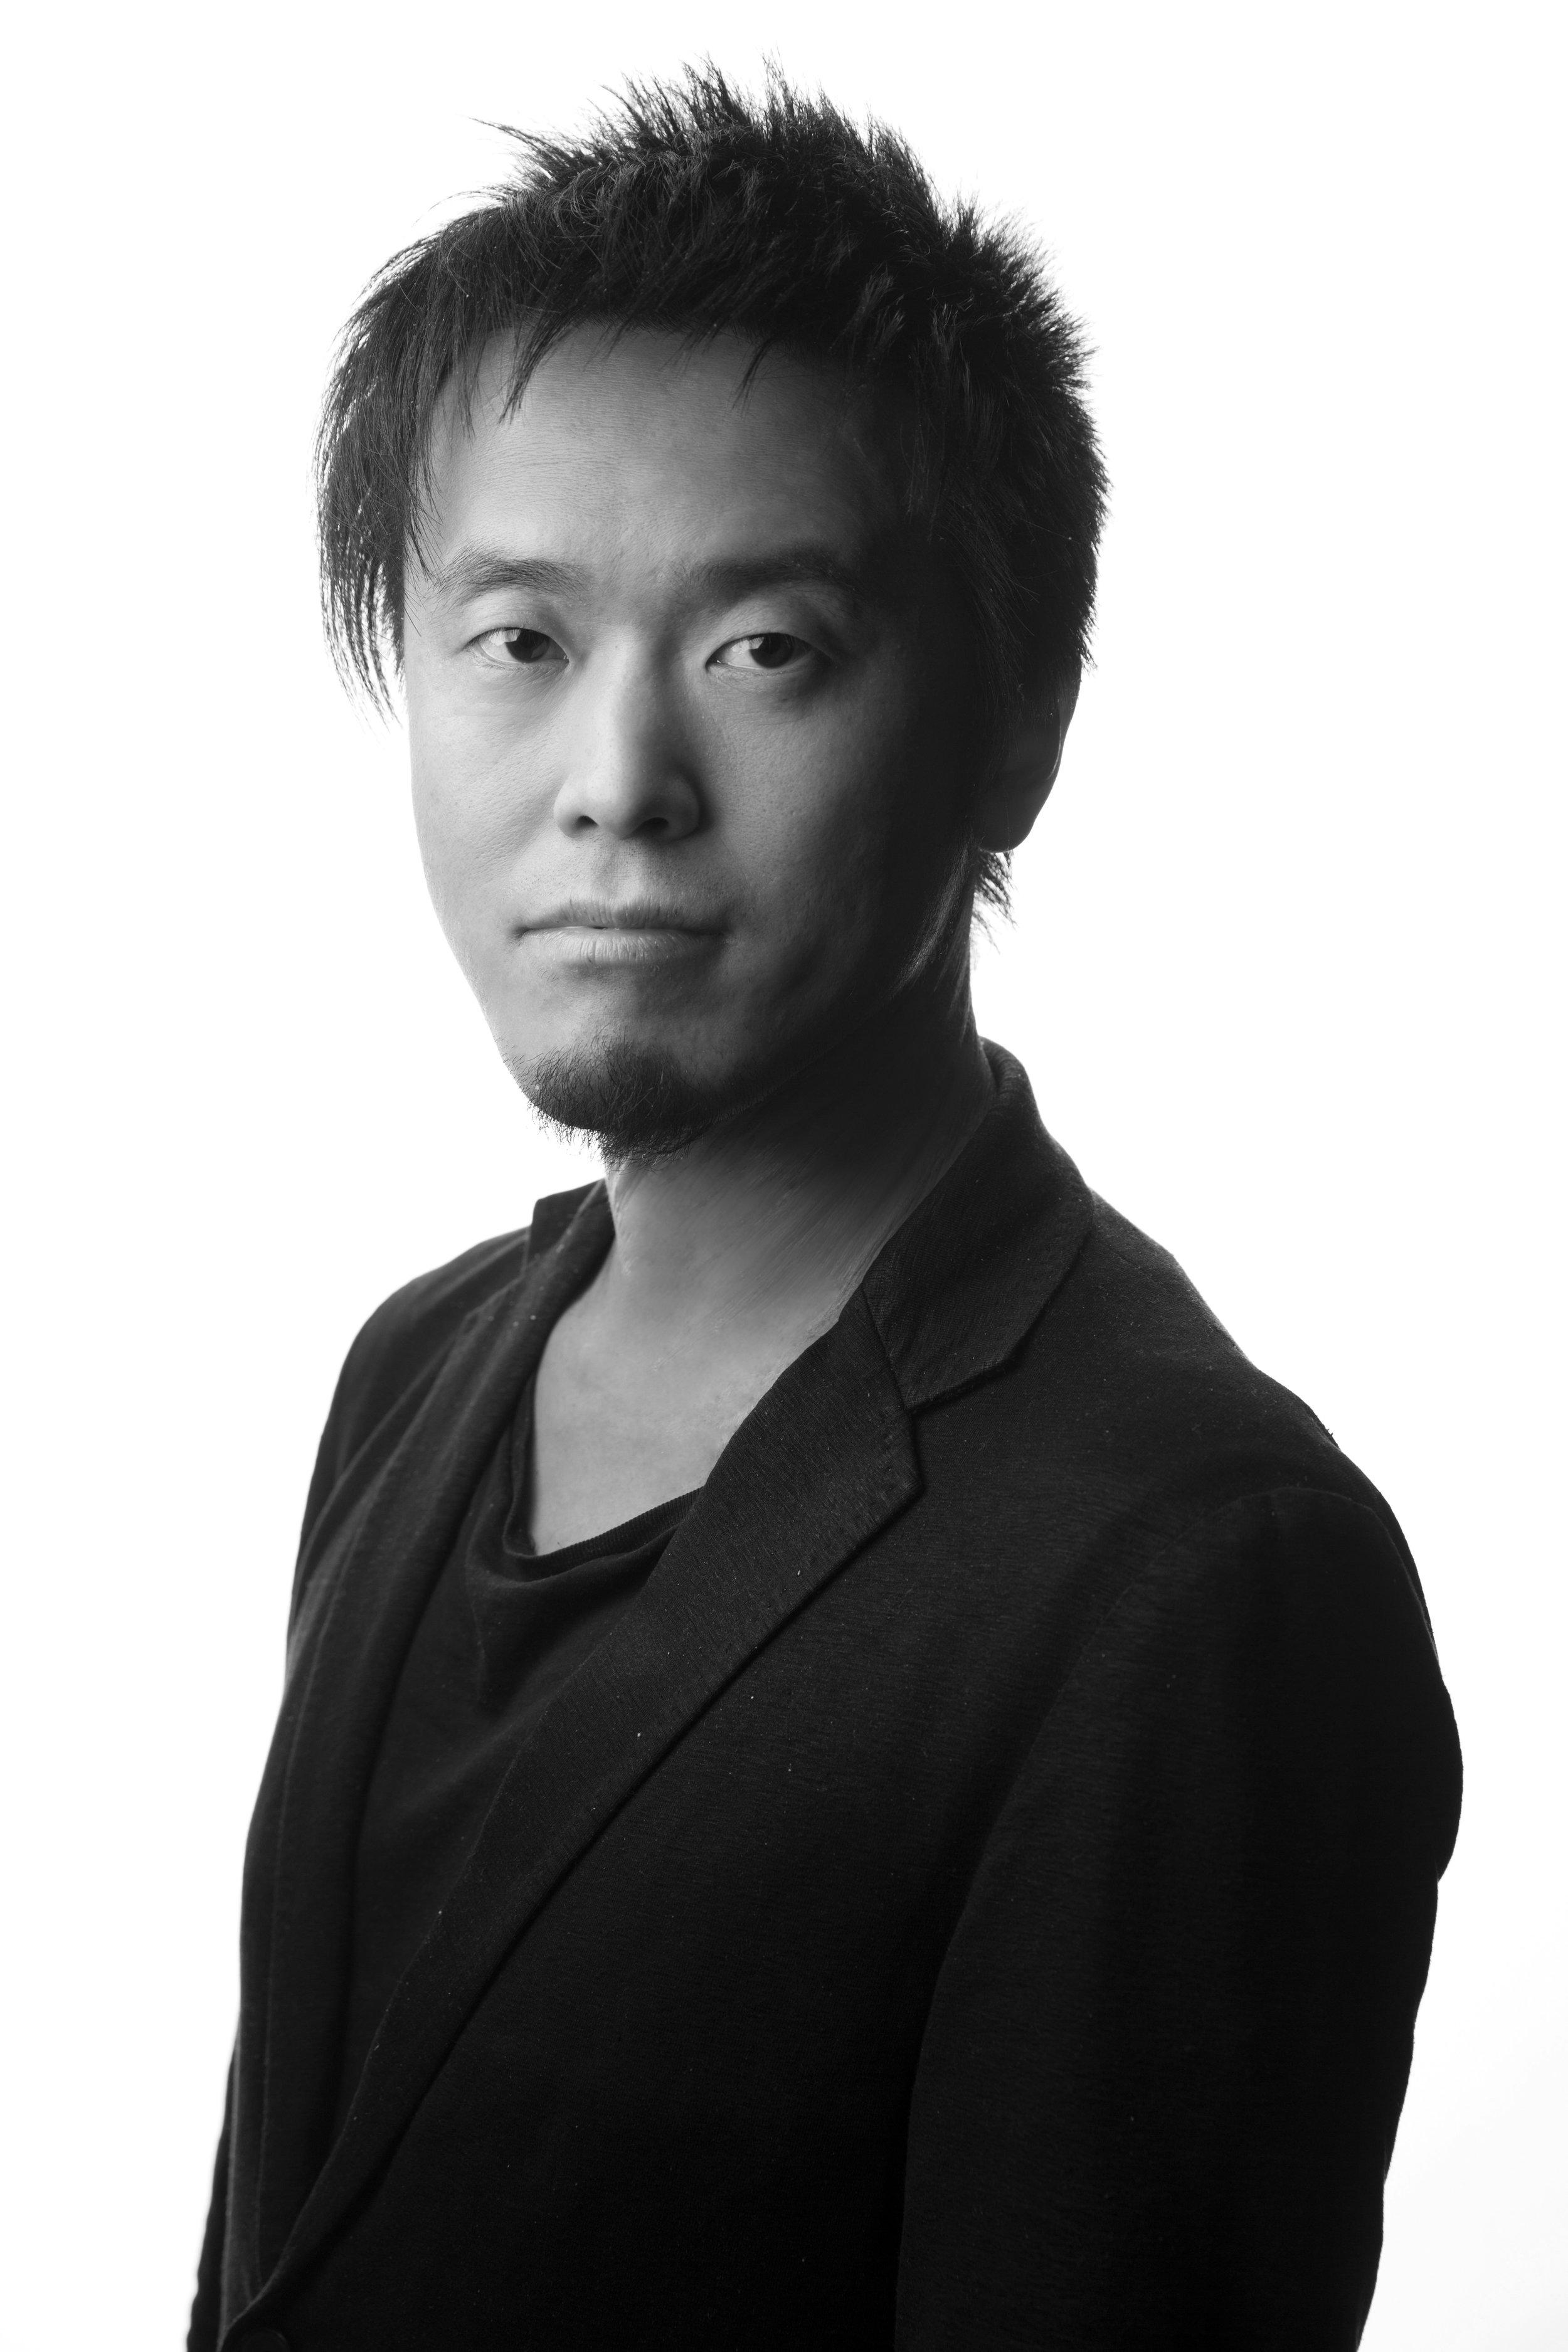 eisuke_monochrome.jpg